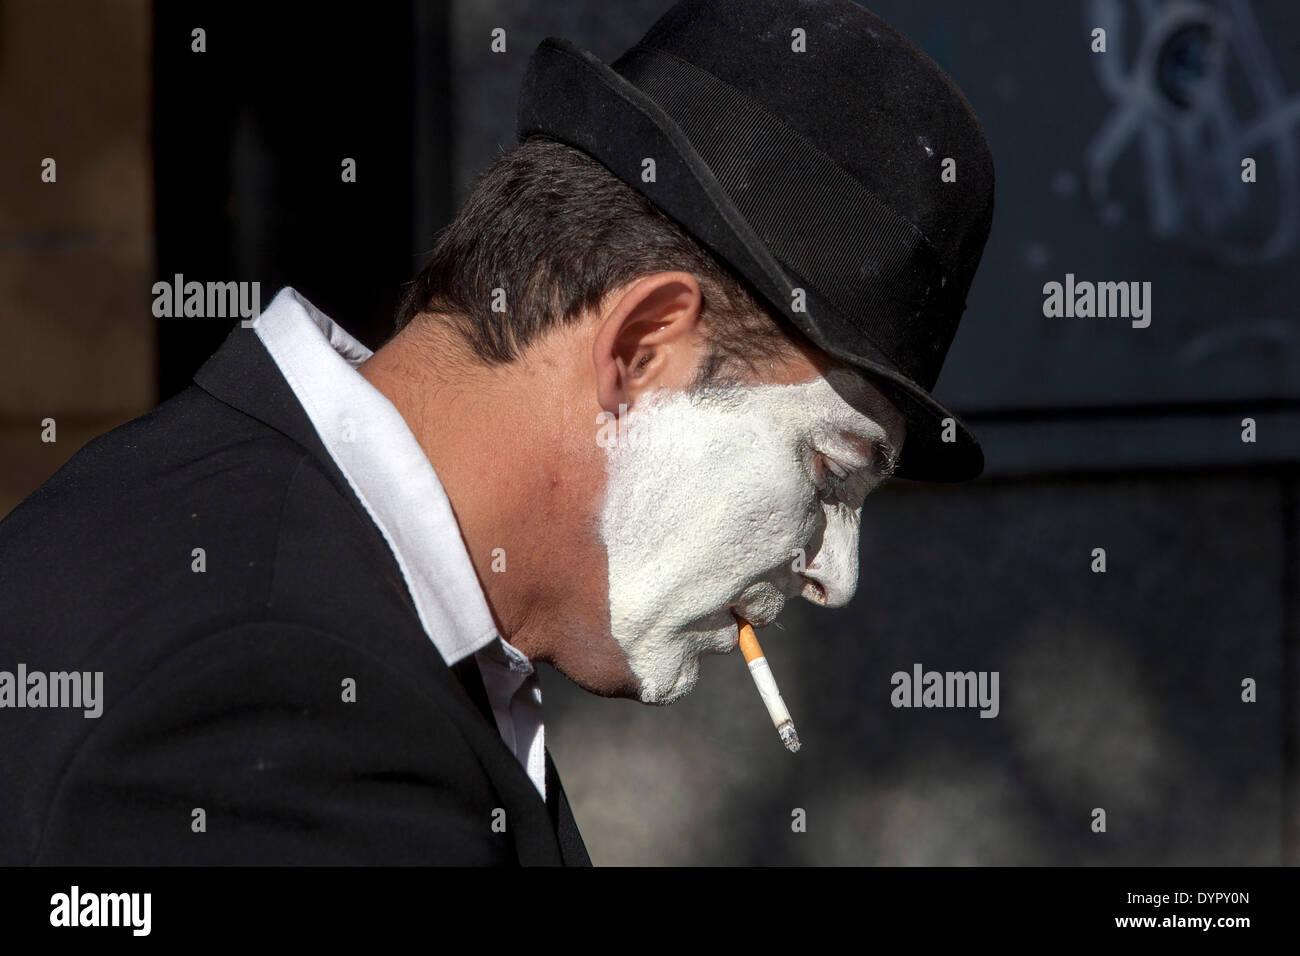 Clown with a cigarette, street busker, Prague, Czech Republic - Stock Image